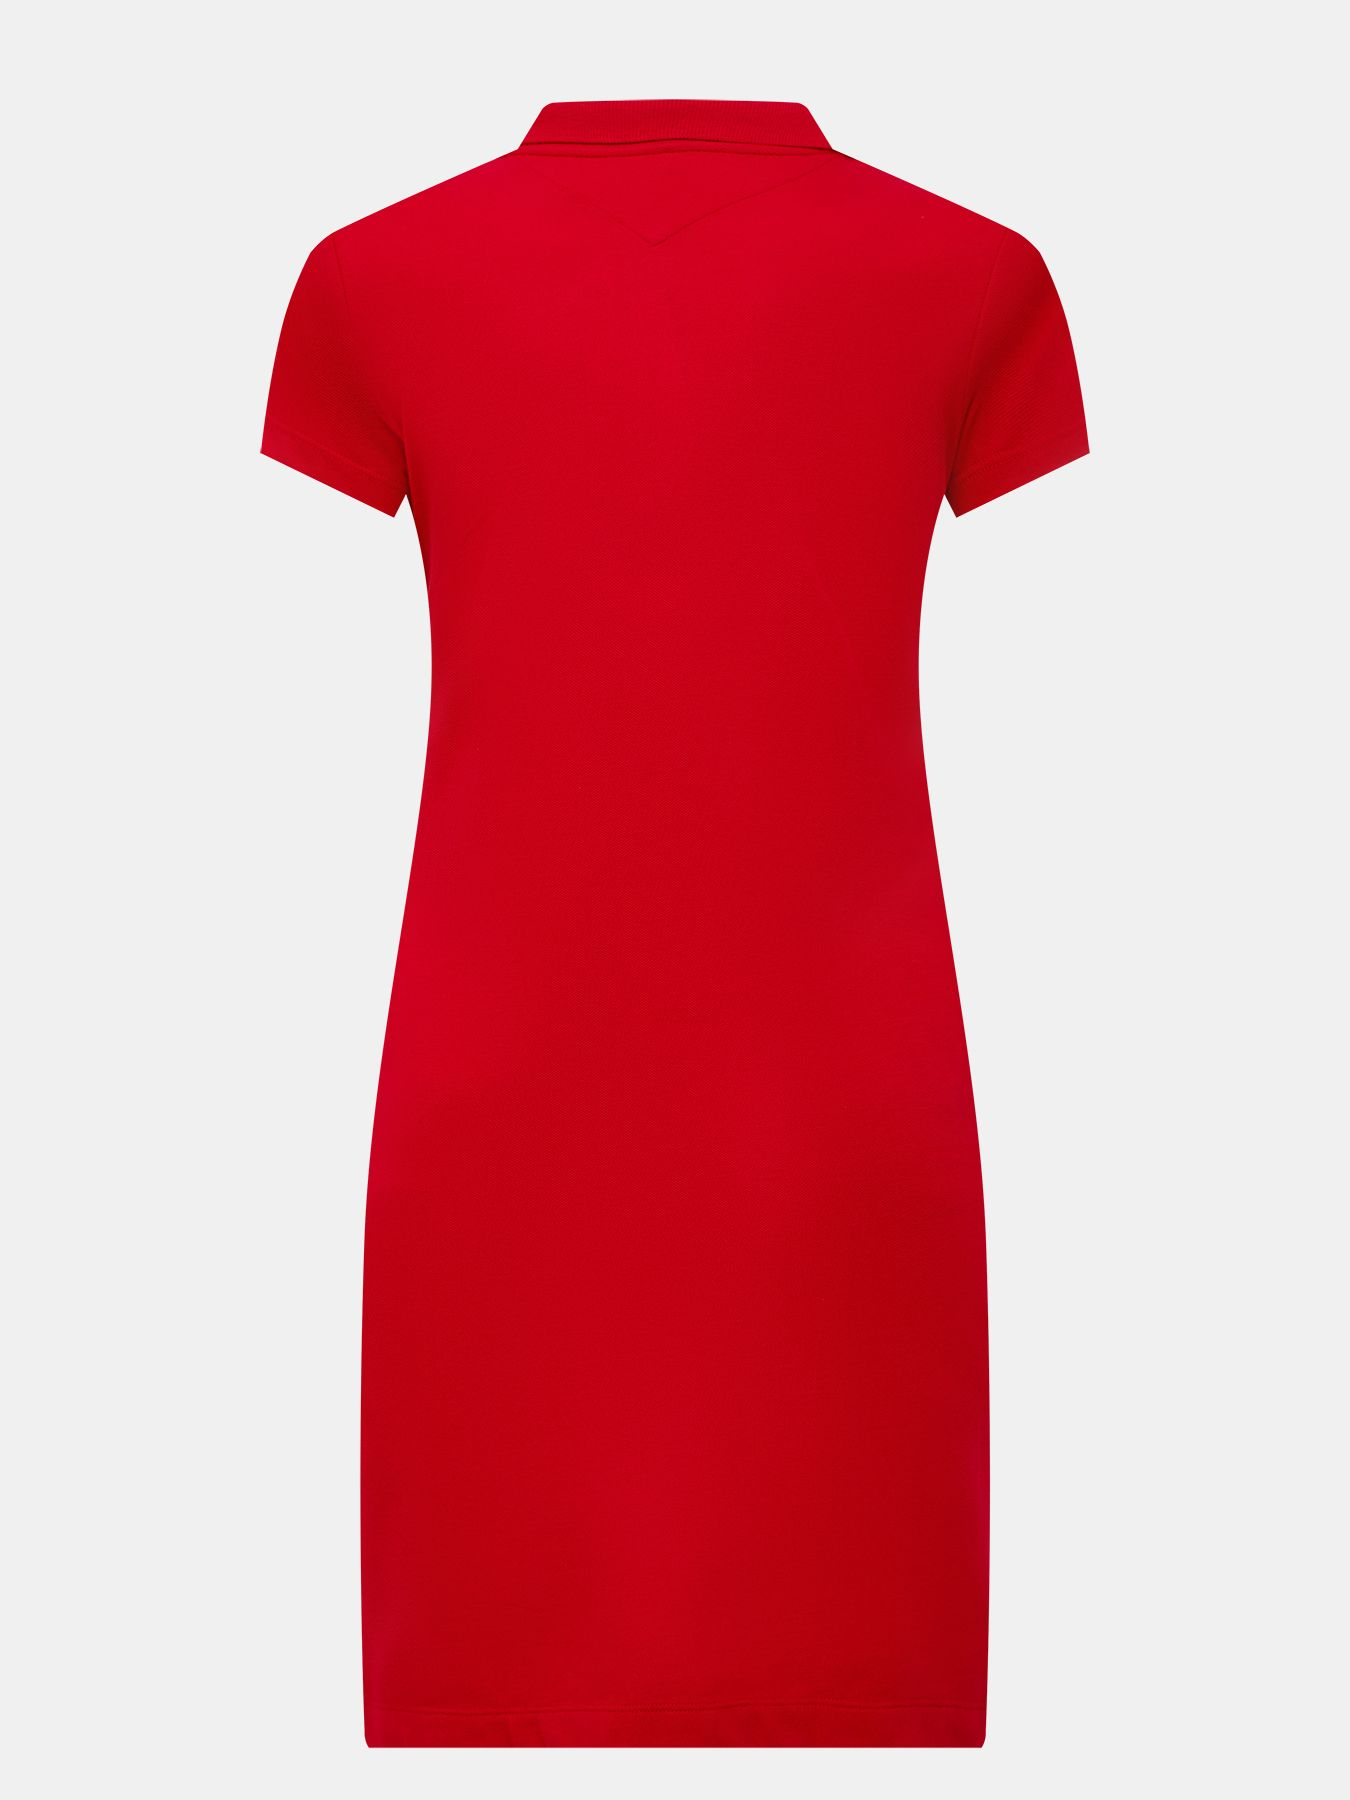 Платье Tommy Hilfiger Платье платье berjer